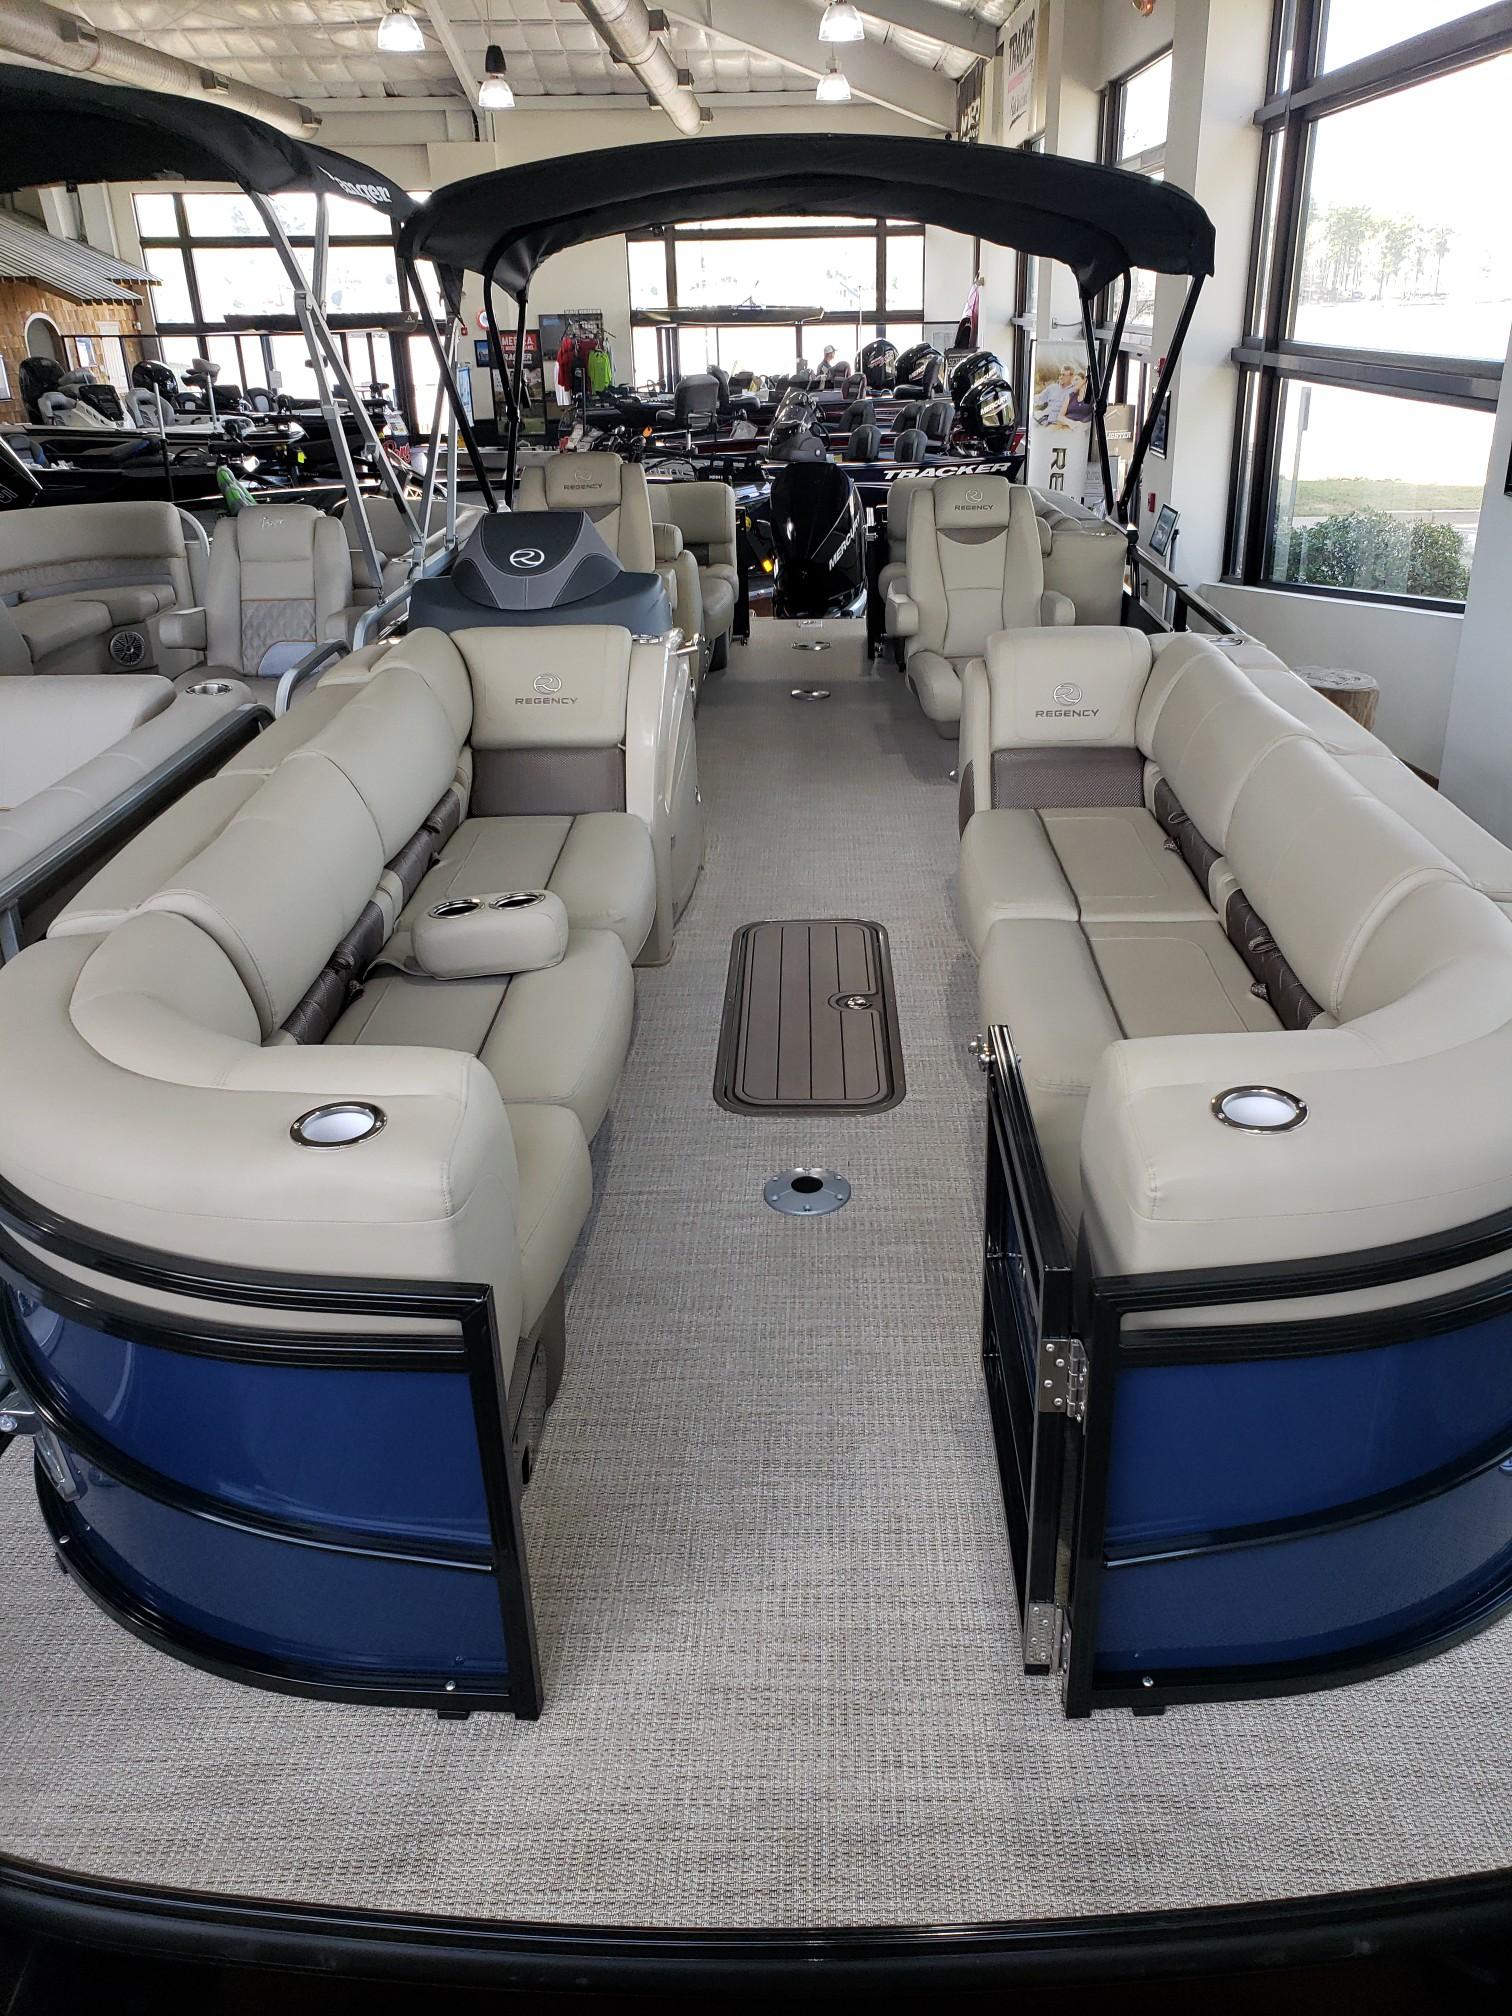 2020 Regency boat for sale, model of the boat is 250 LE3 w/300L Verado & Image # 16 of 27